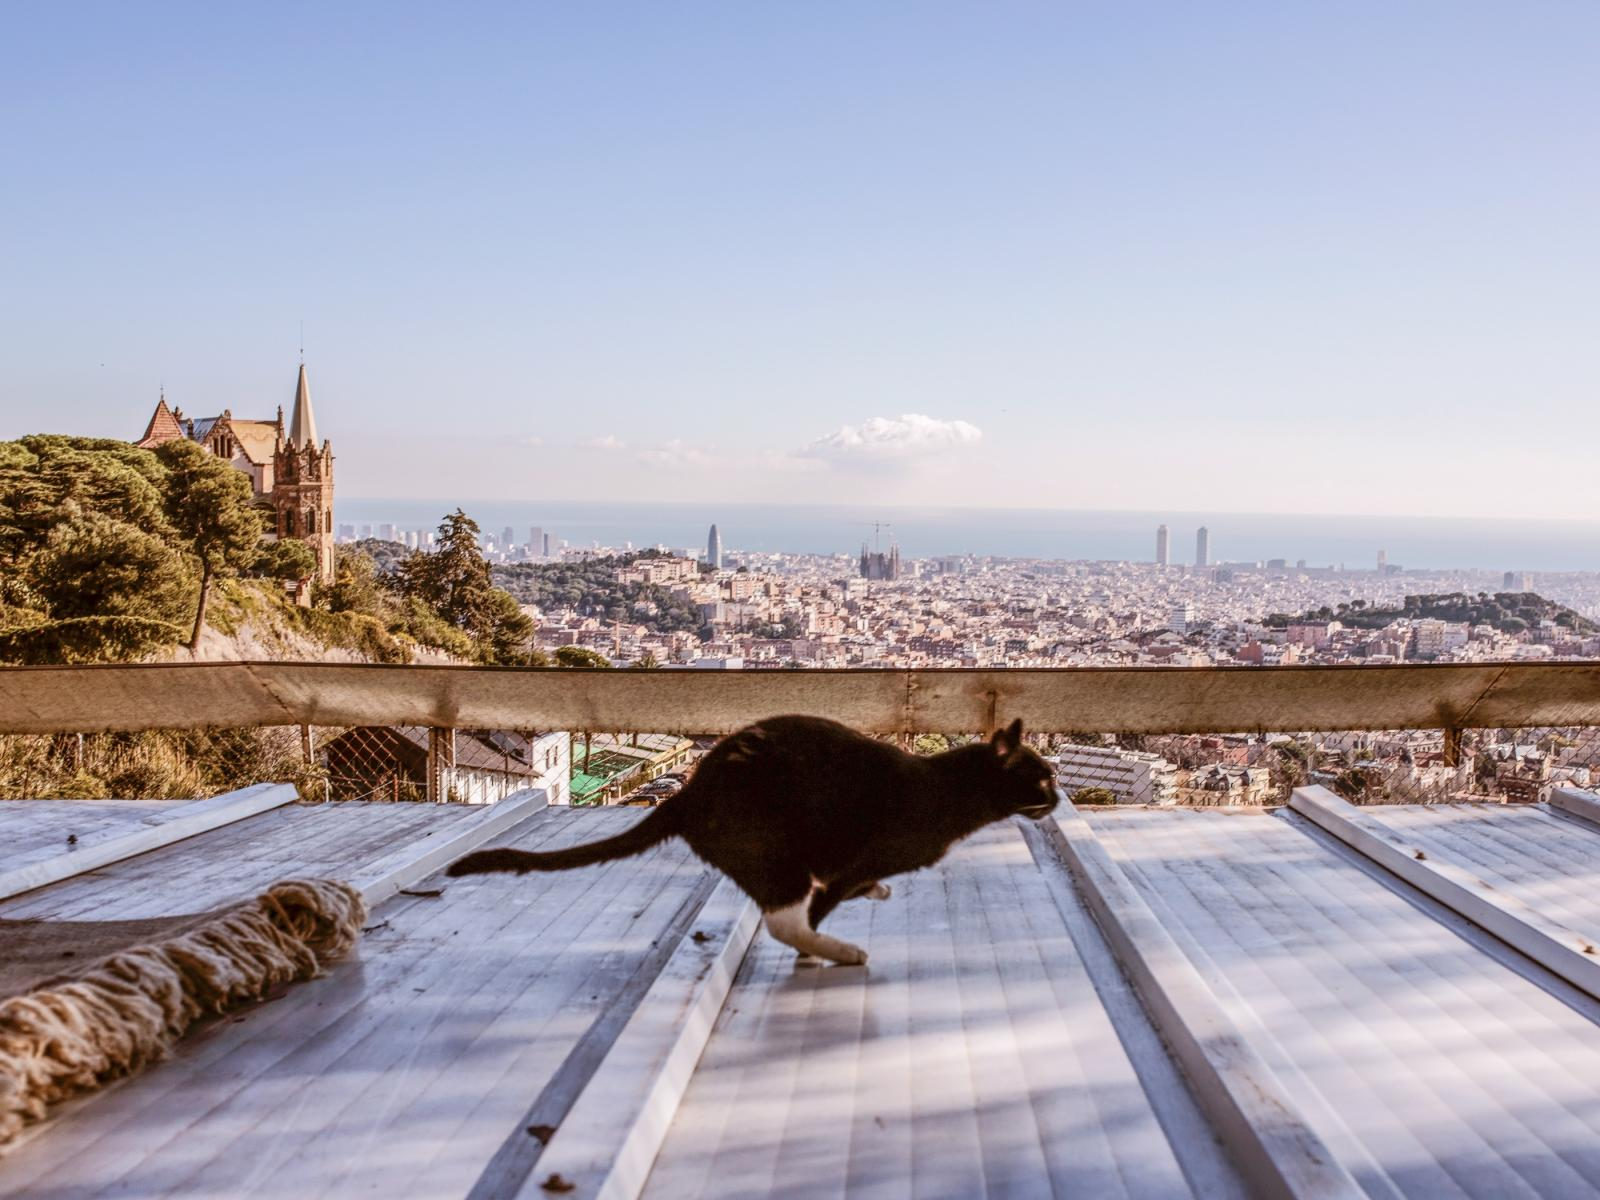 Anihuman being, Barcelona, Spain 2017-2018